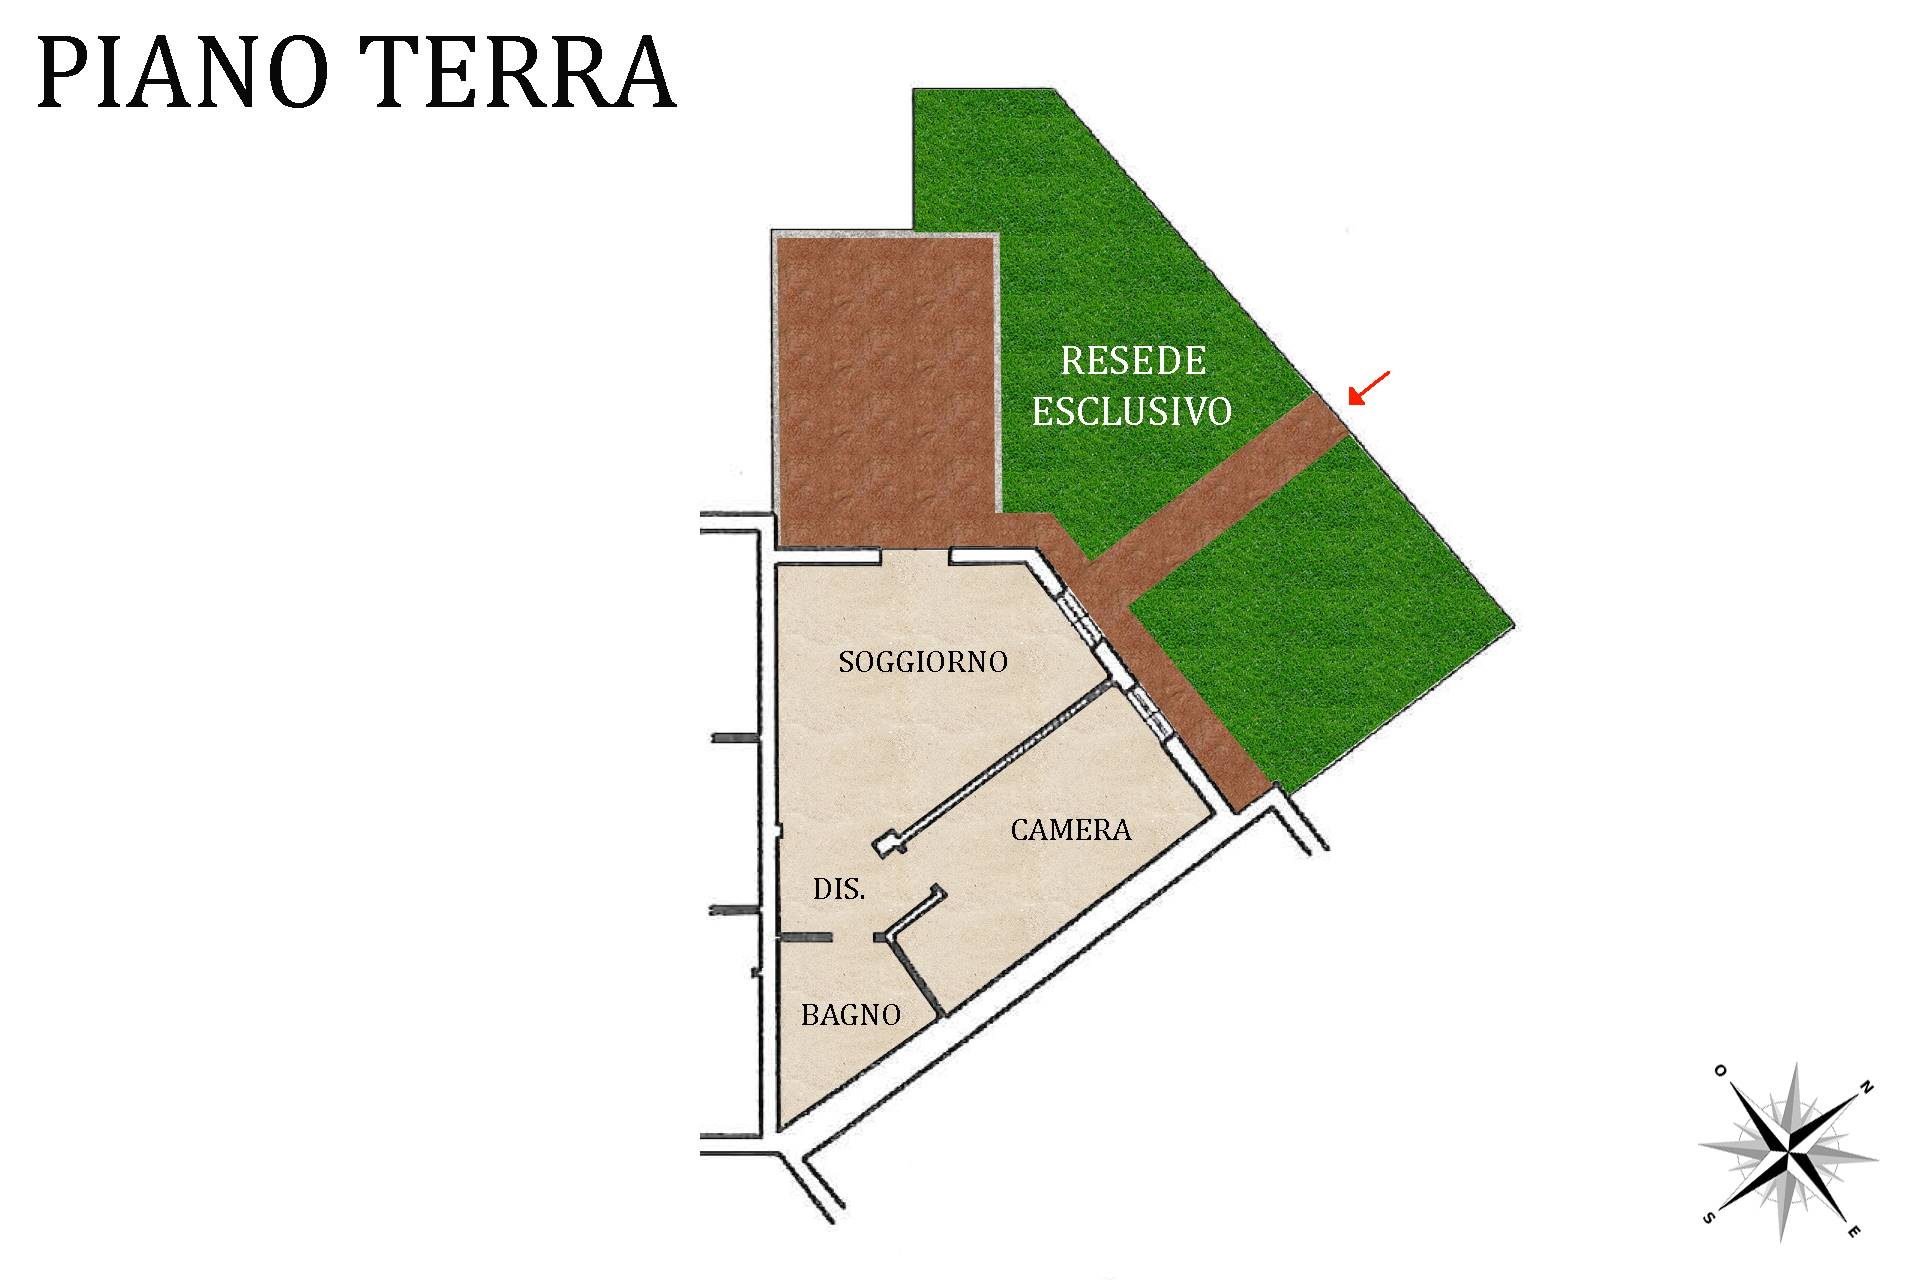 Planimetria appartamento e resede esclusivo